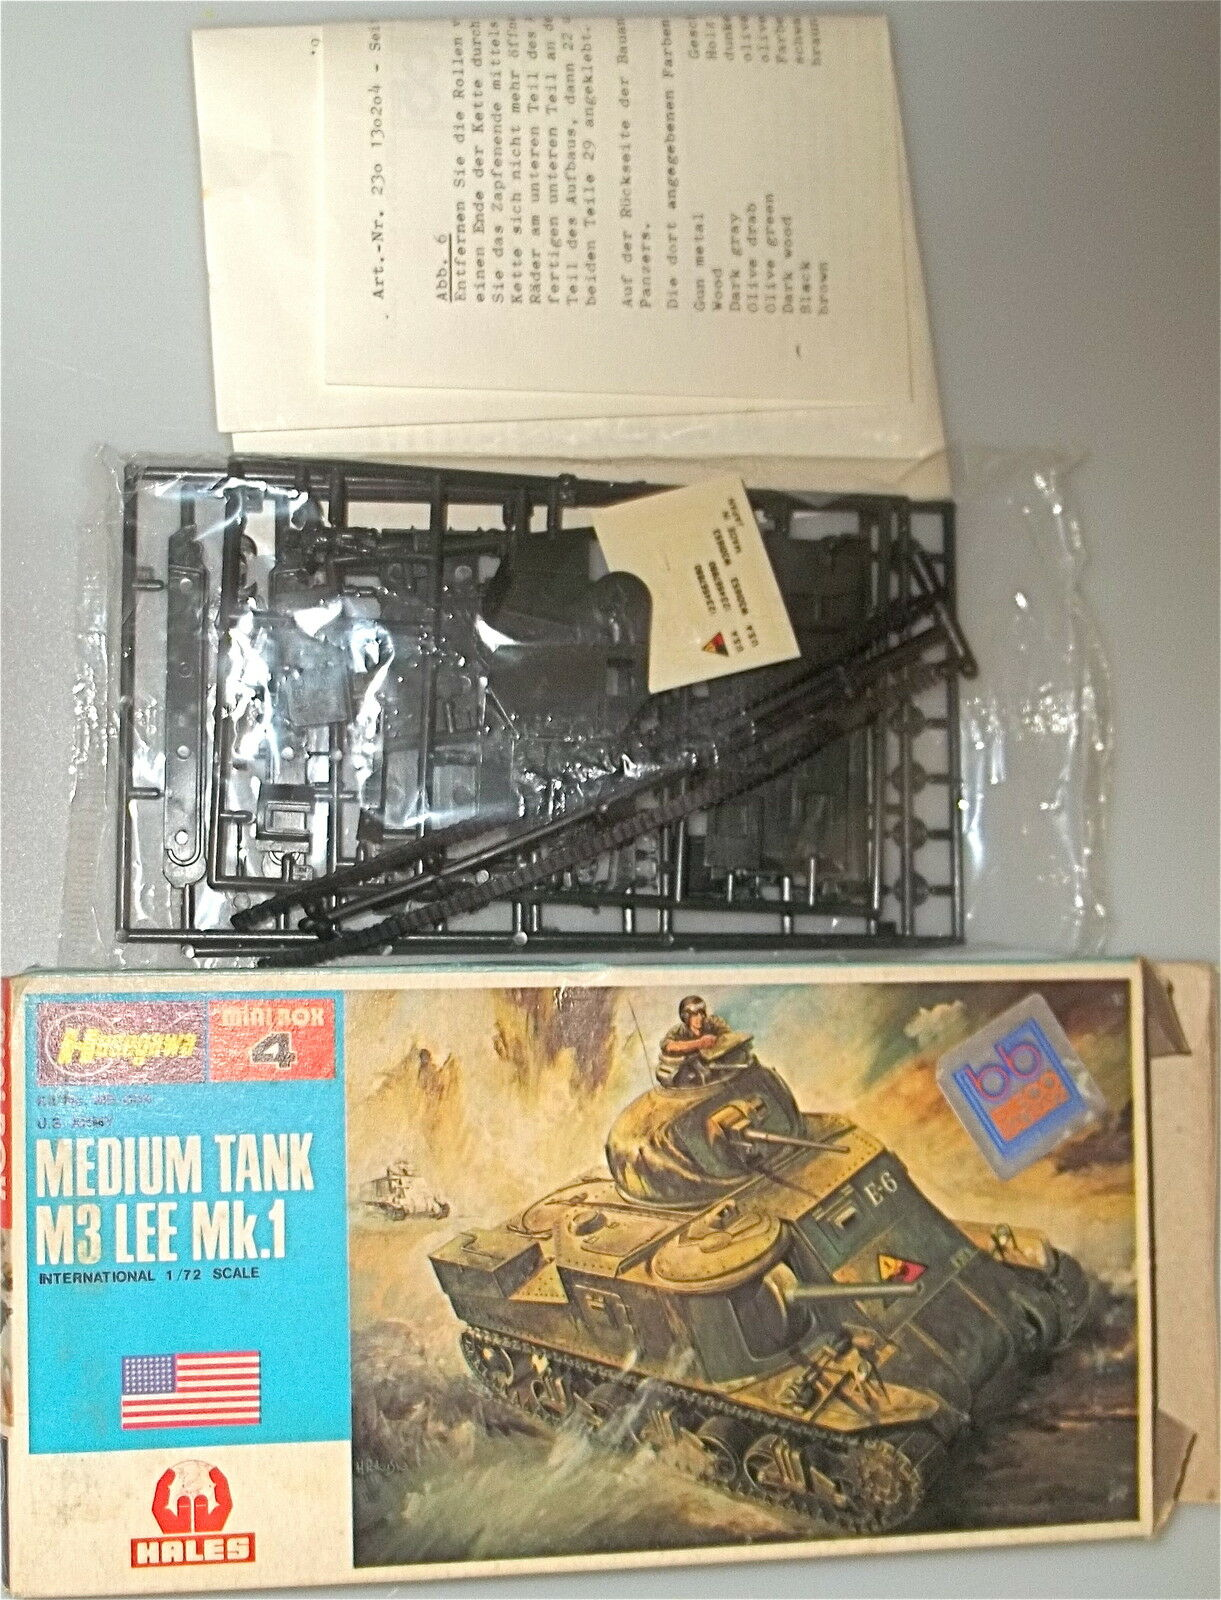 Medium Tank M3 Lee mk. 1 Hasegawa Mini BOX4 Scale 1 72